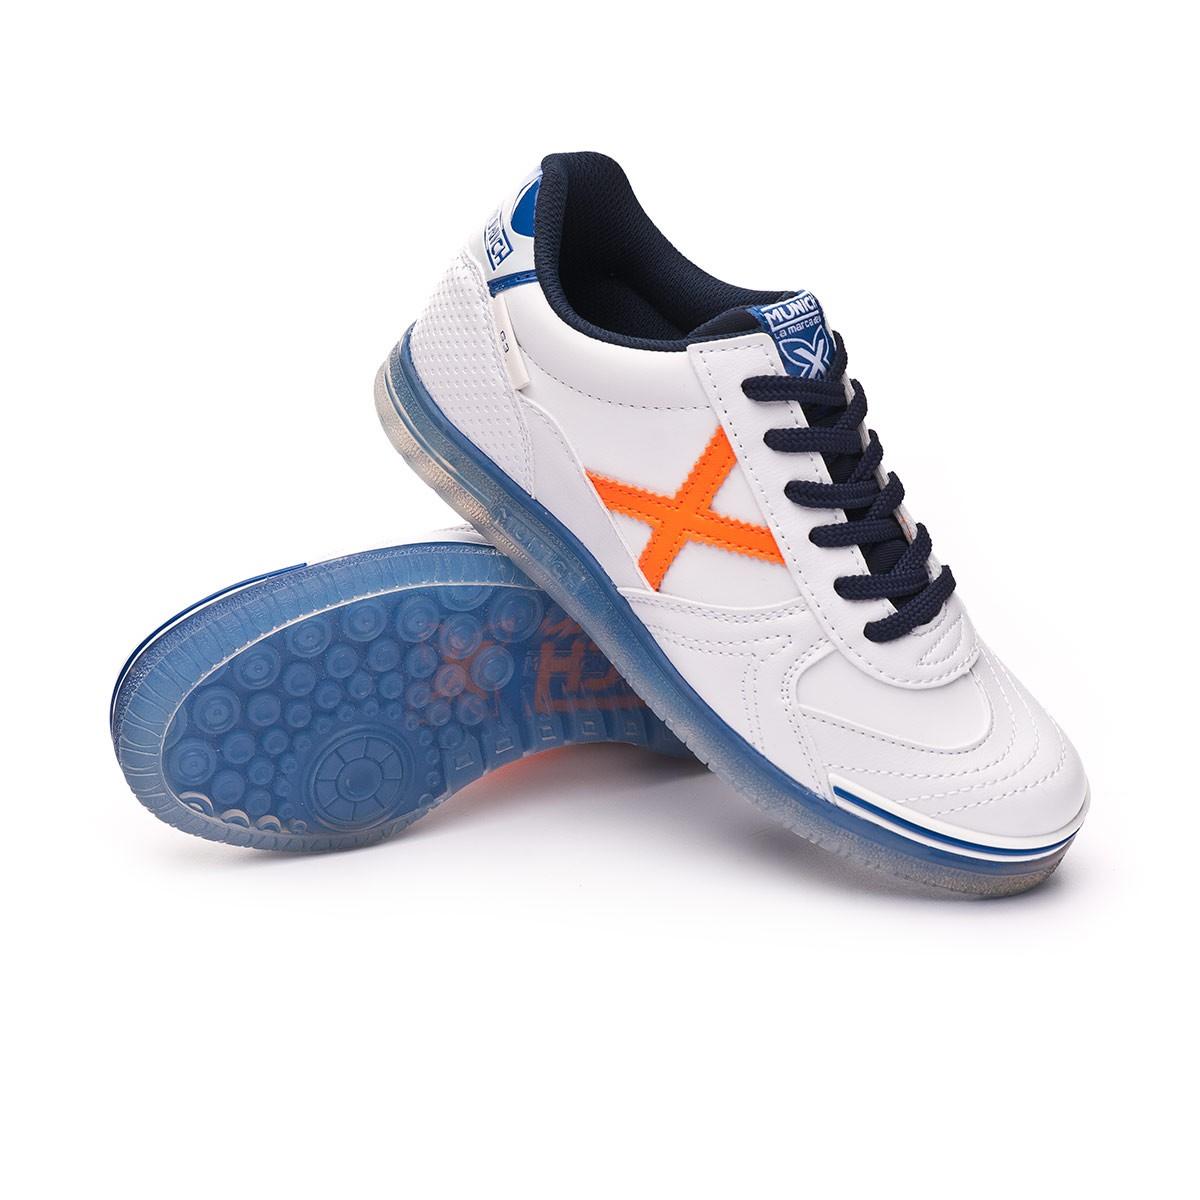 829da61303e Futsal Boot Munich Kids G3 Glow Blanca-Azul-Naranja - Tienda de ...